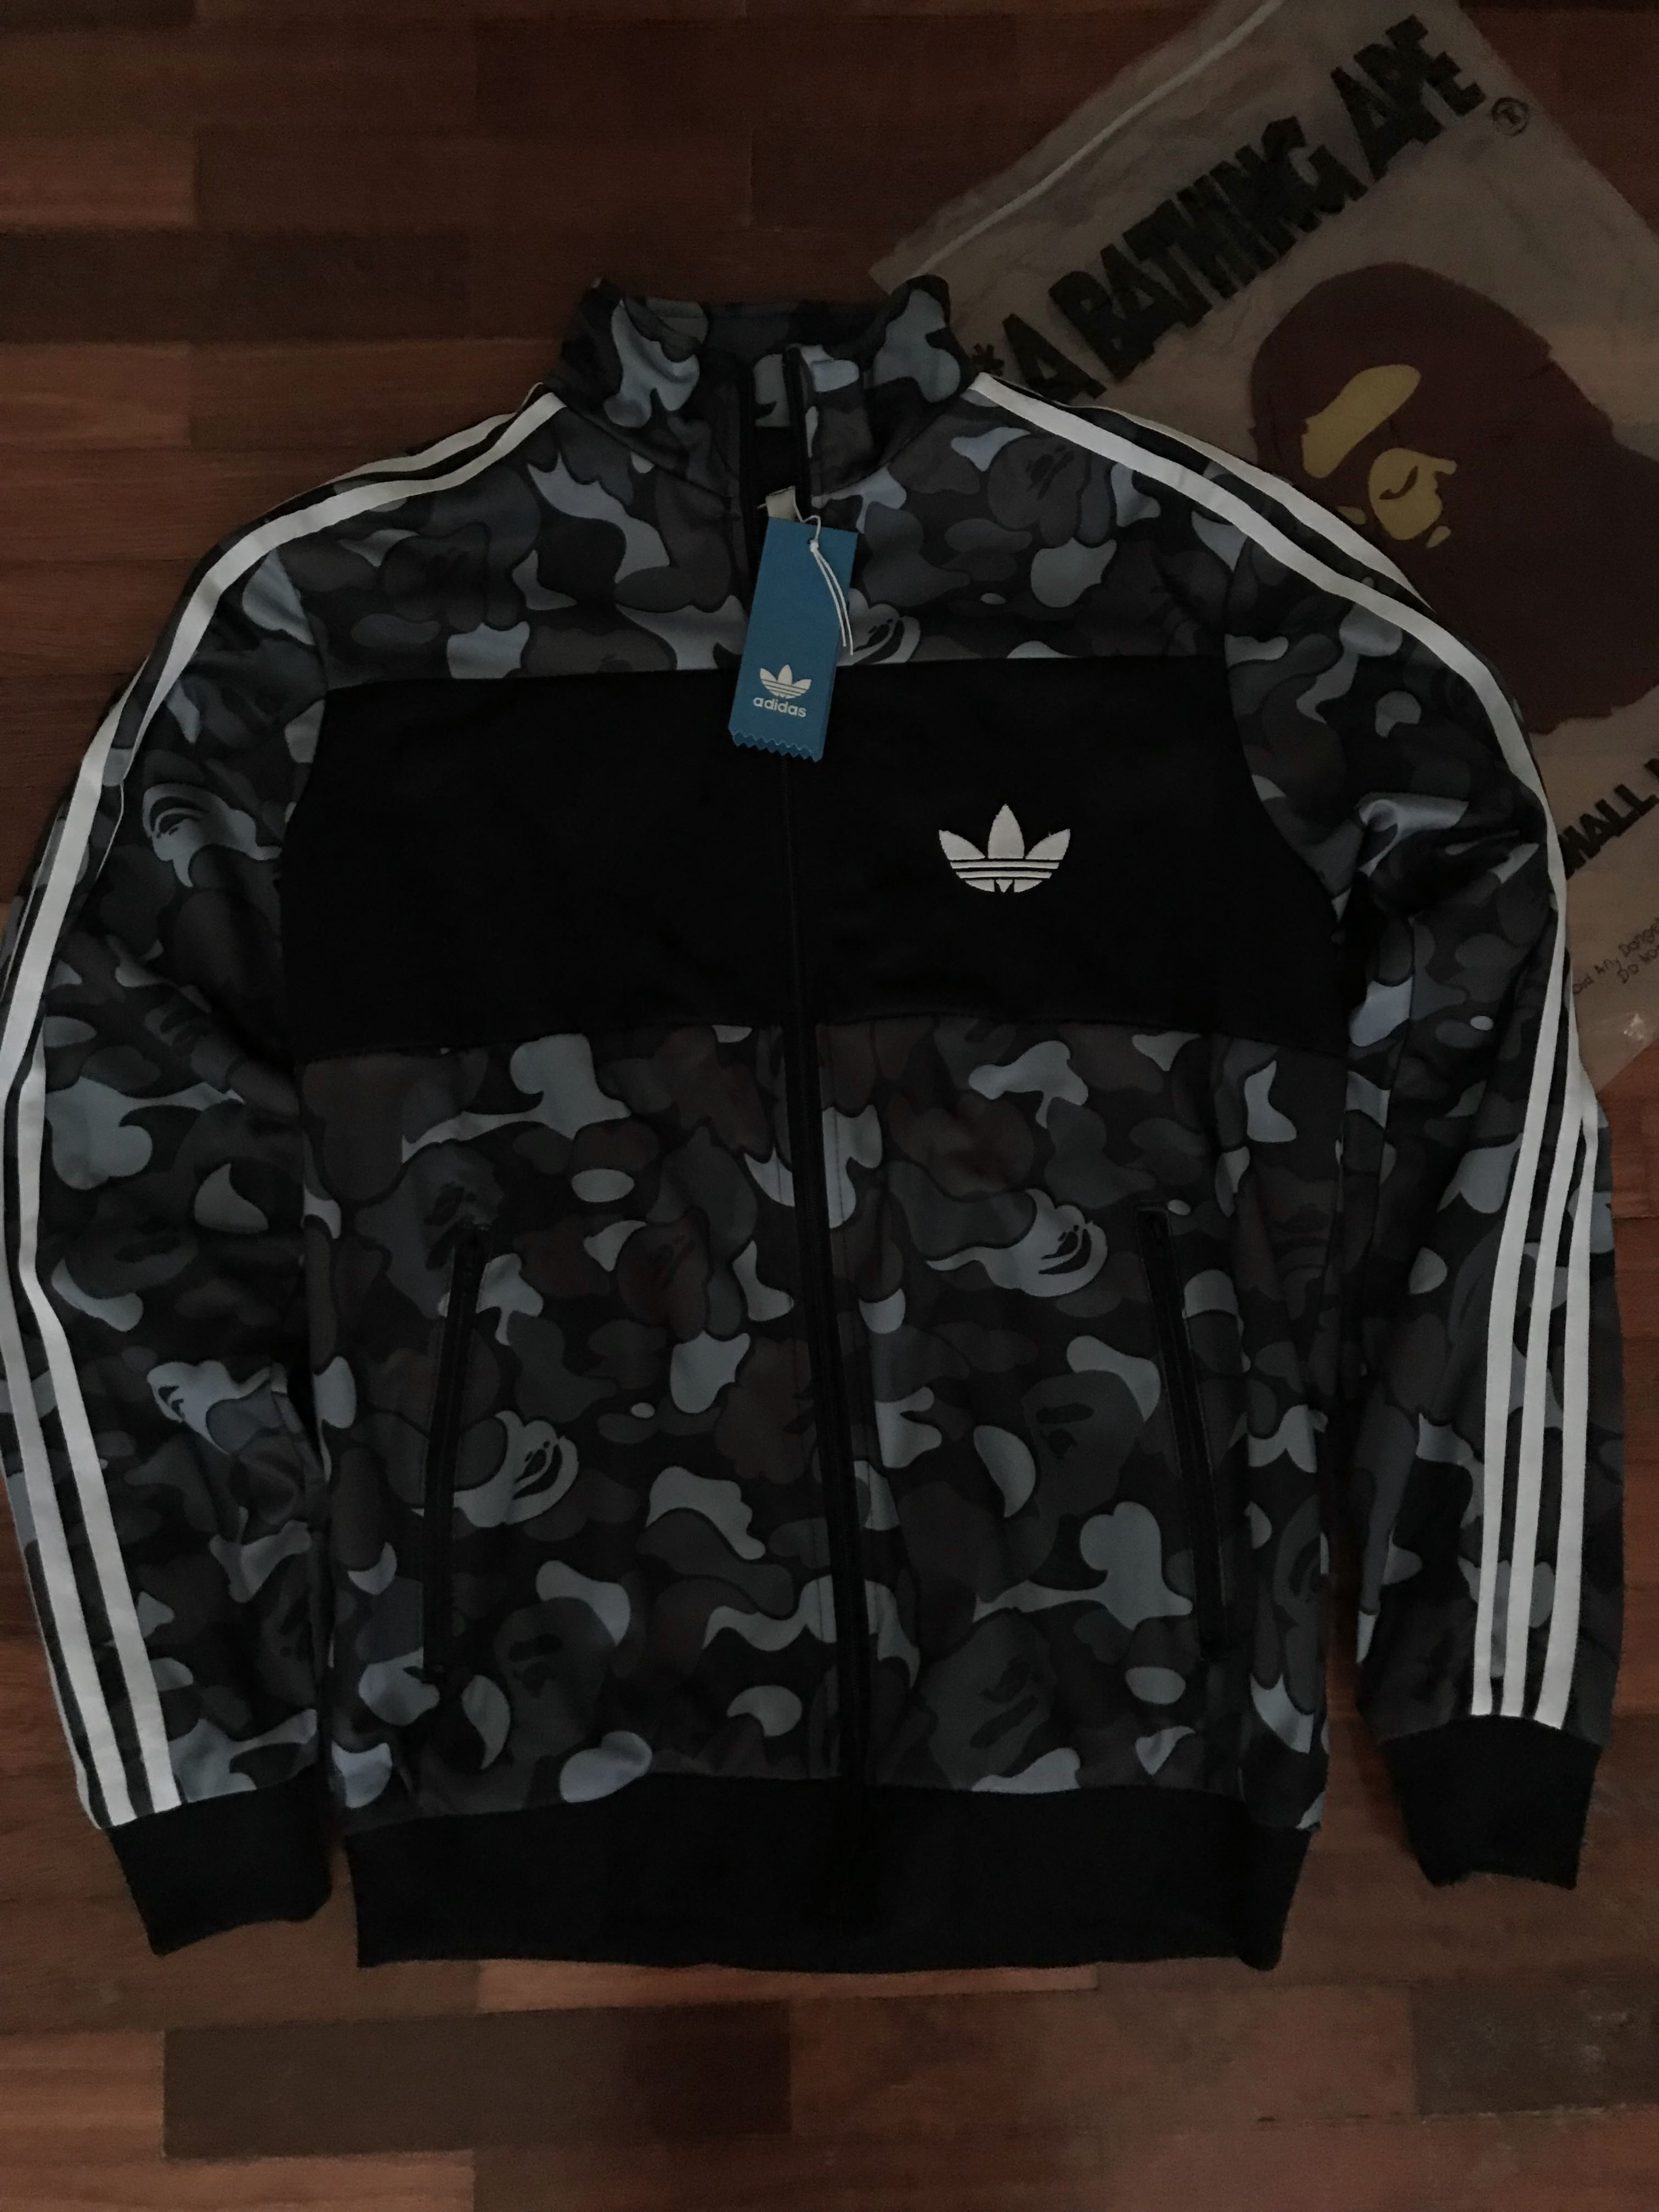 407c81e1 Adidas Bape Firebird Jacket (READY STOCK), Men's Fashion, Clothes on  Carousell